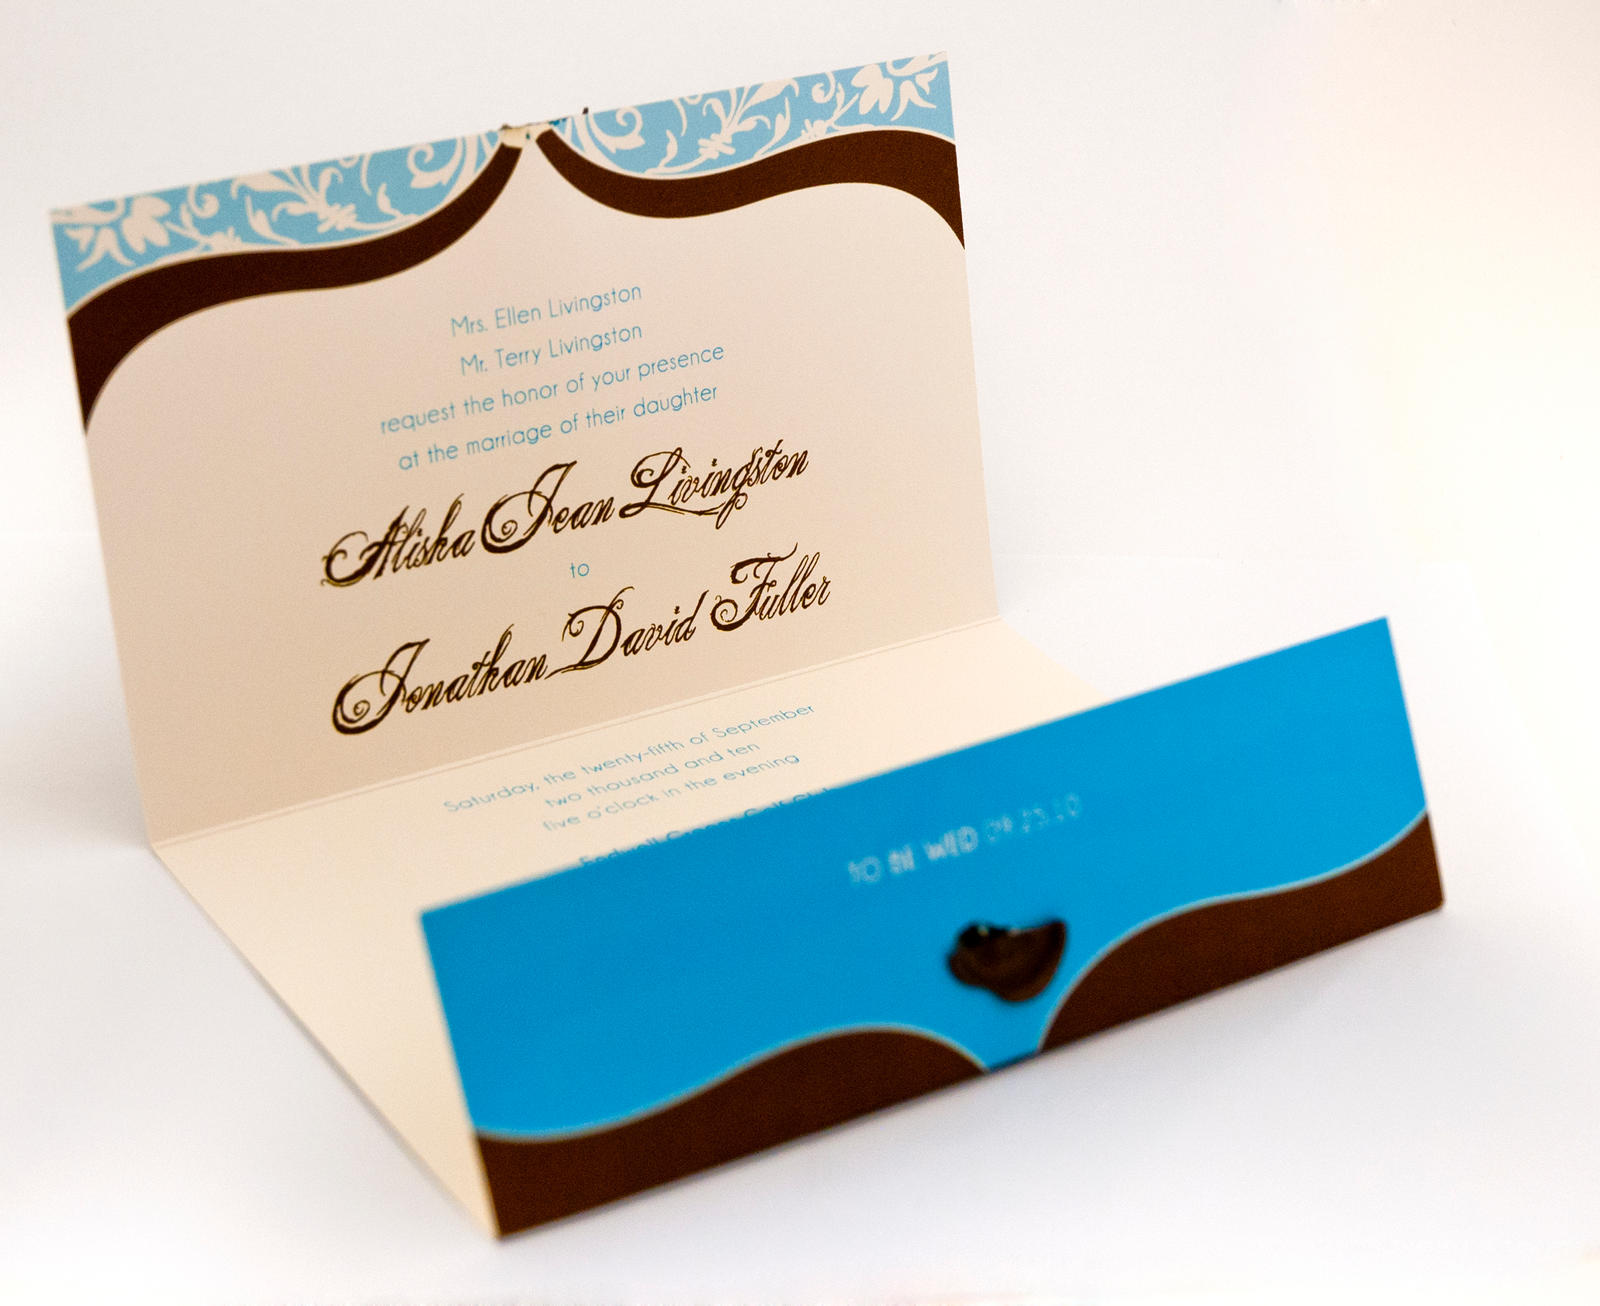 indesign invitation template free - Ecza.solinf.co